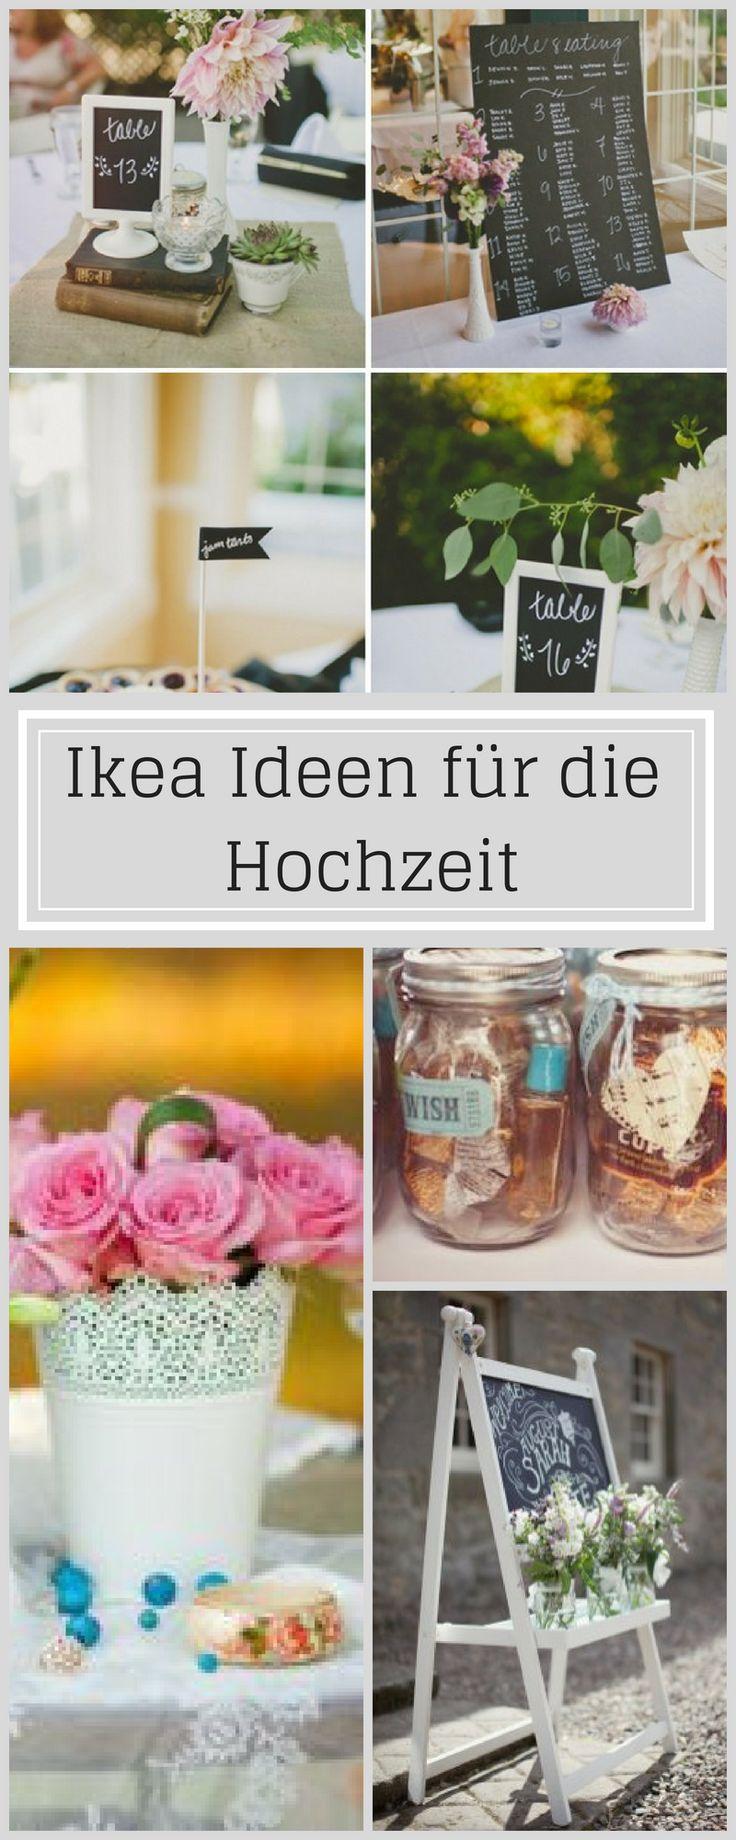 DIY – ideas & inspirations for the wedding of Ikea – Civil Wedding